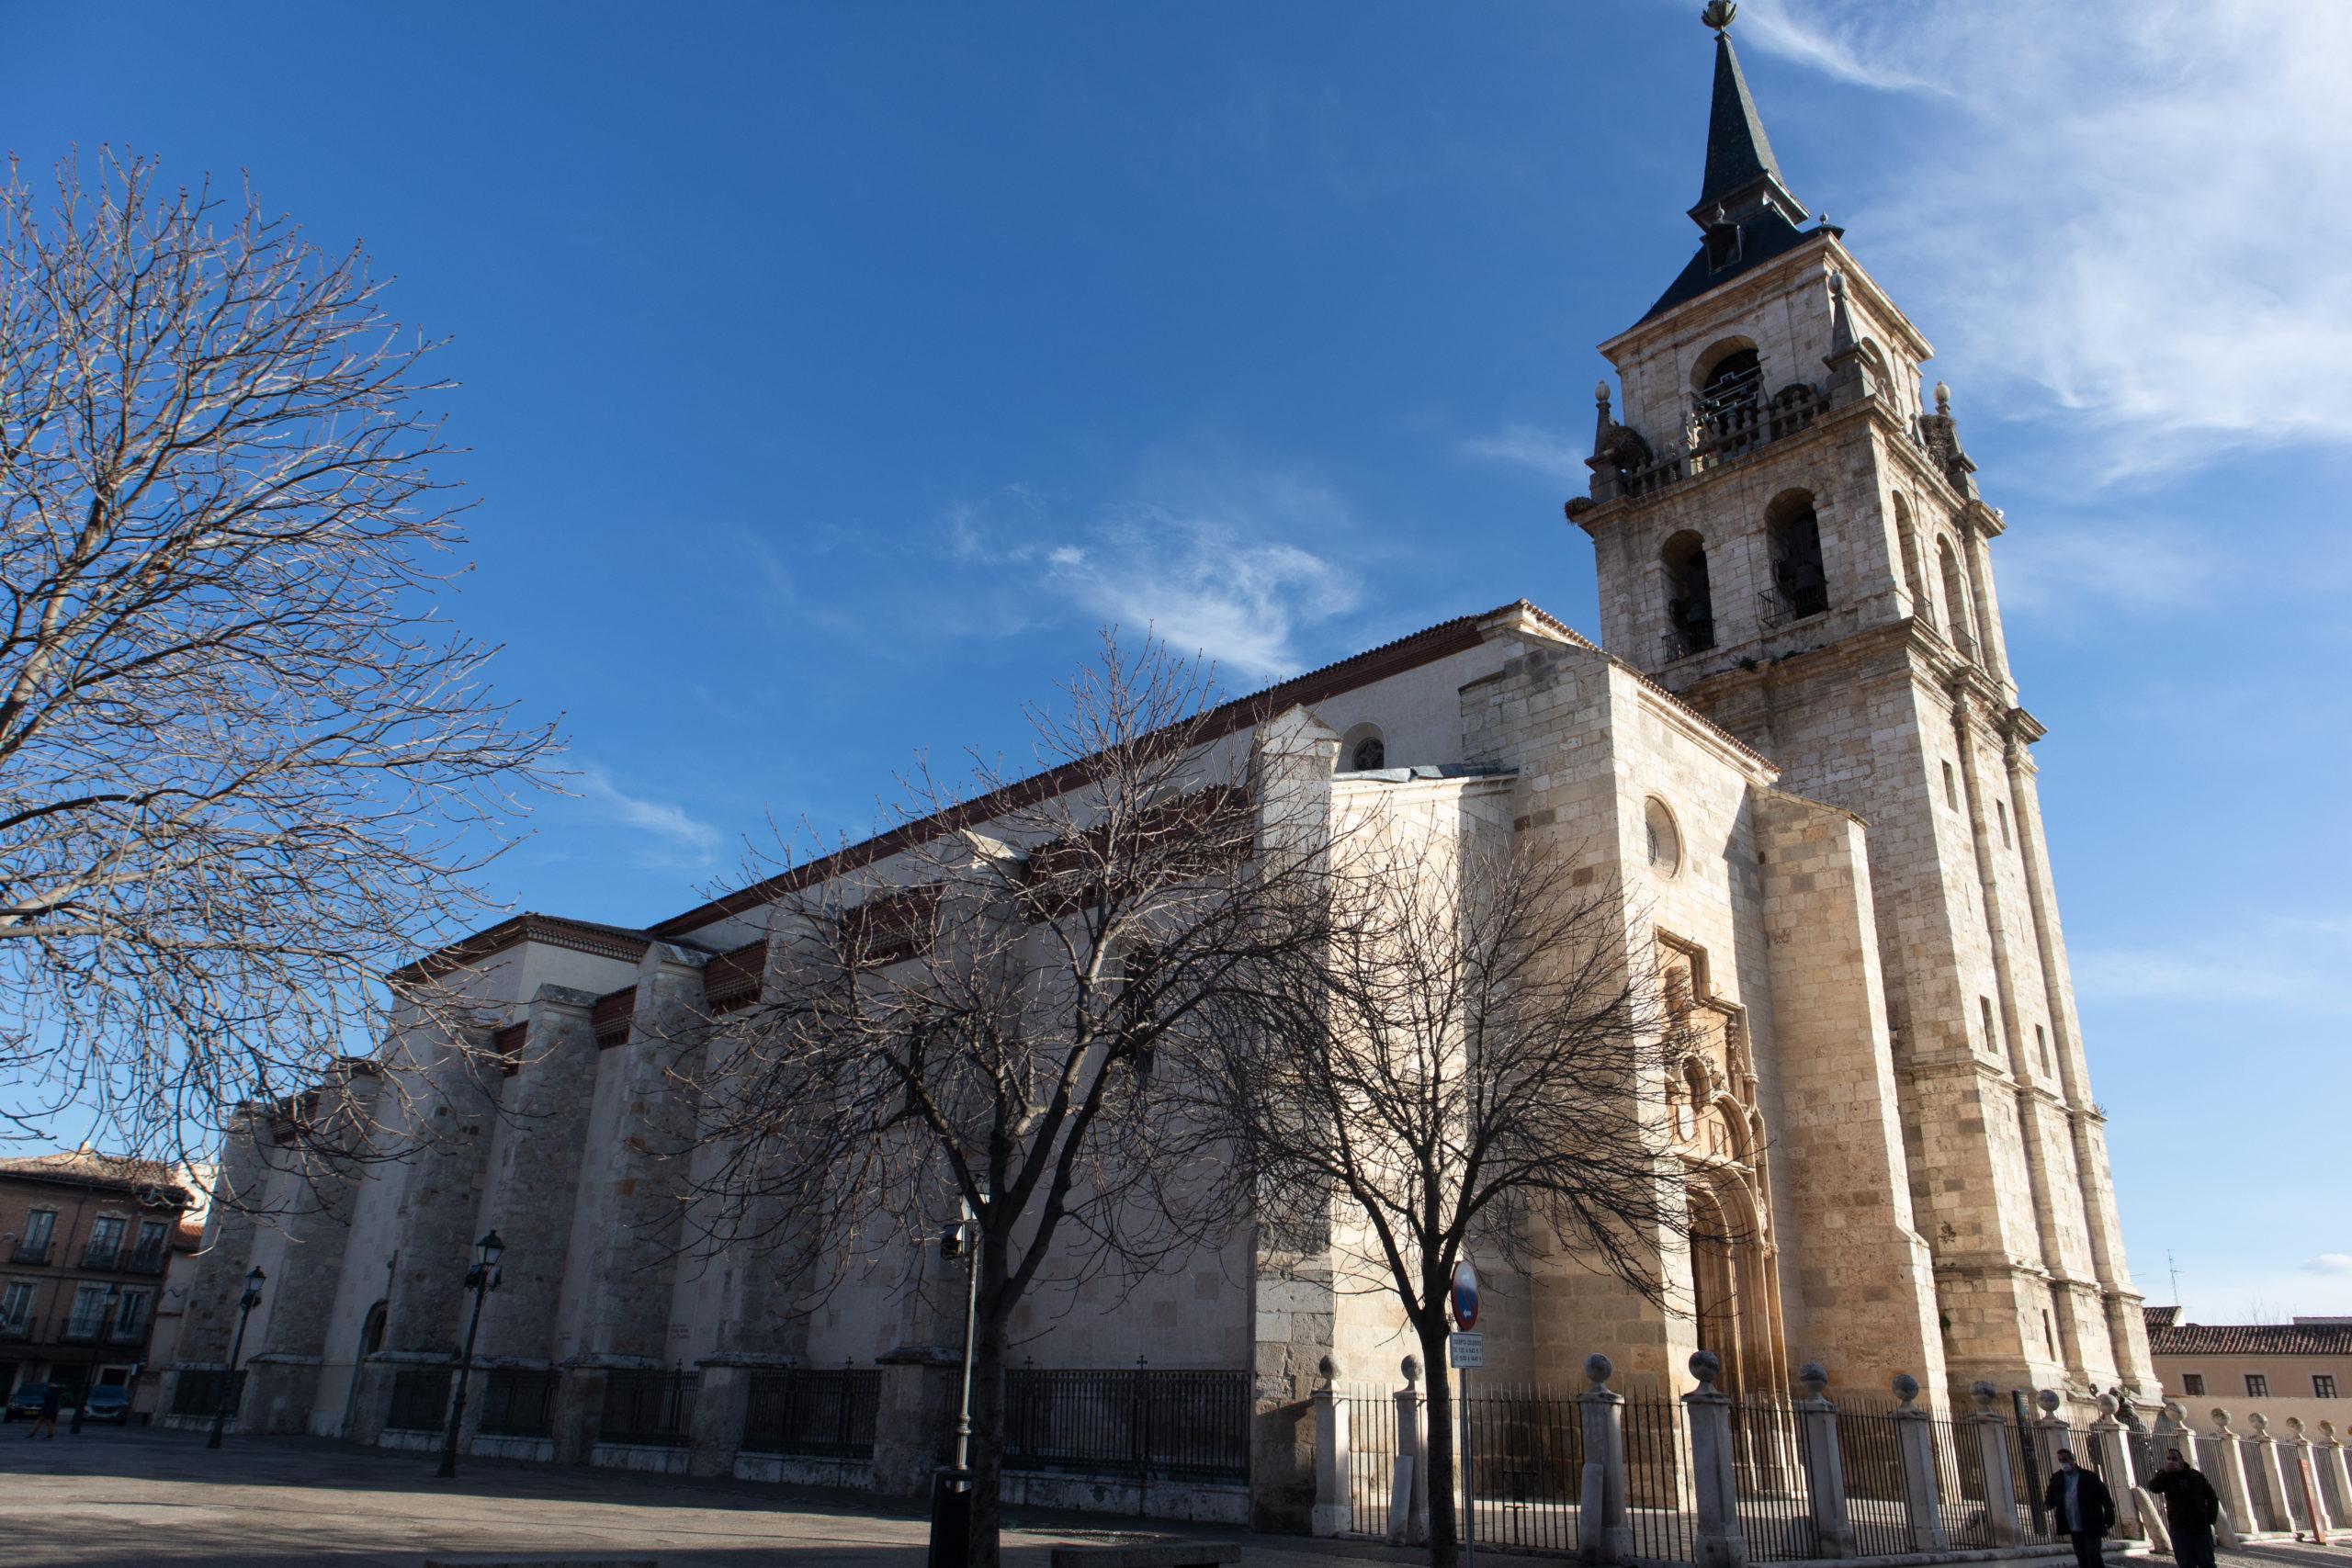 catedral-magistral-alcala-henares